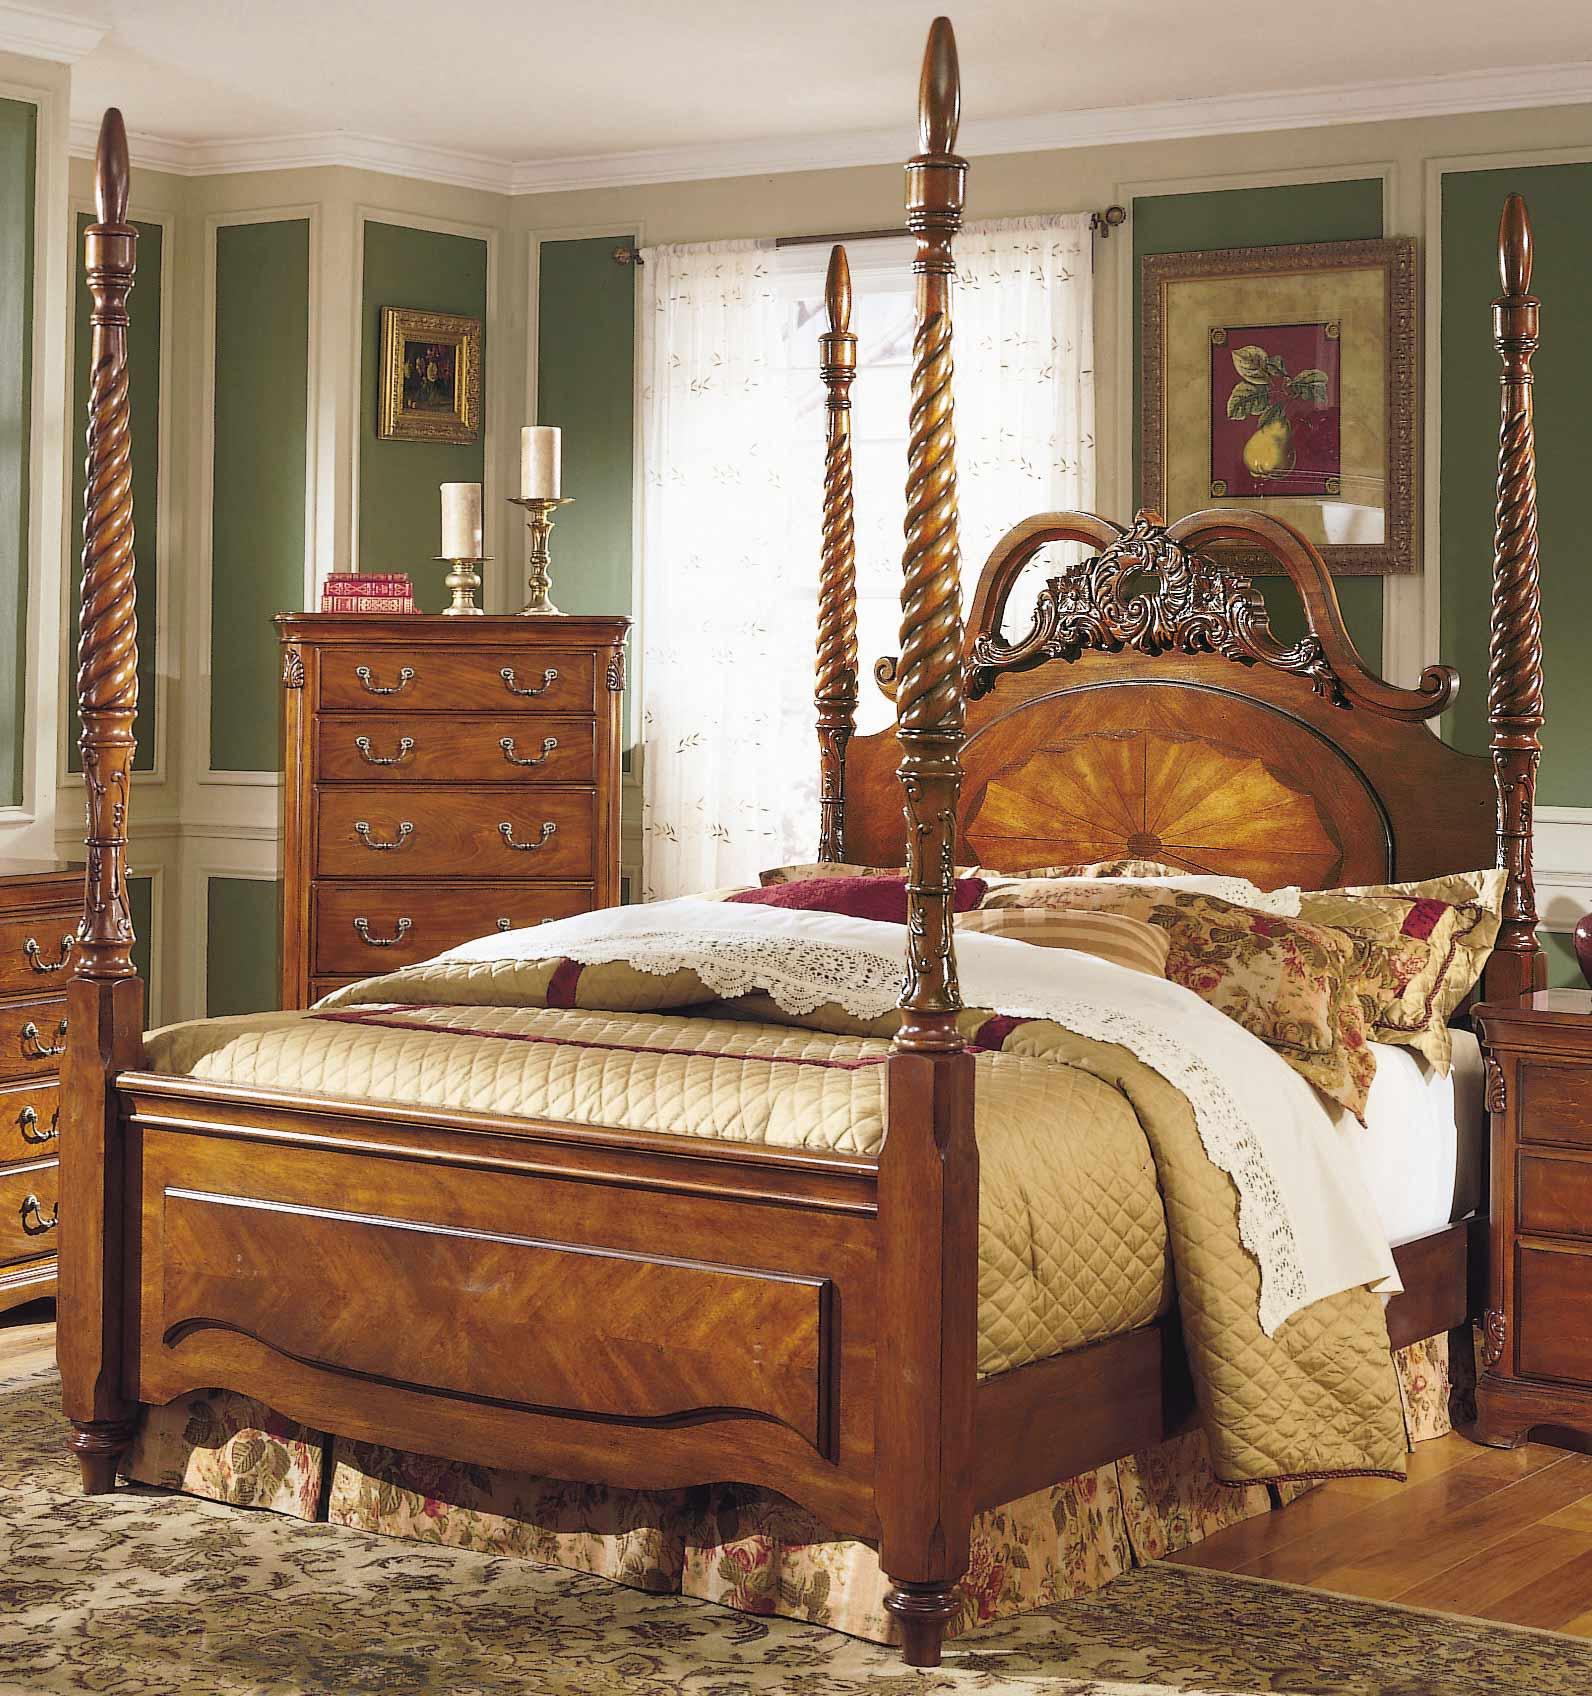 Homelegance Mediterranean Queen Poster Bed